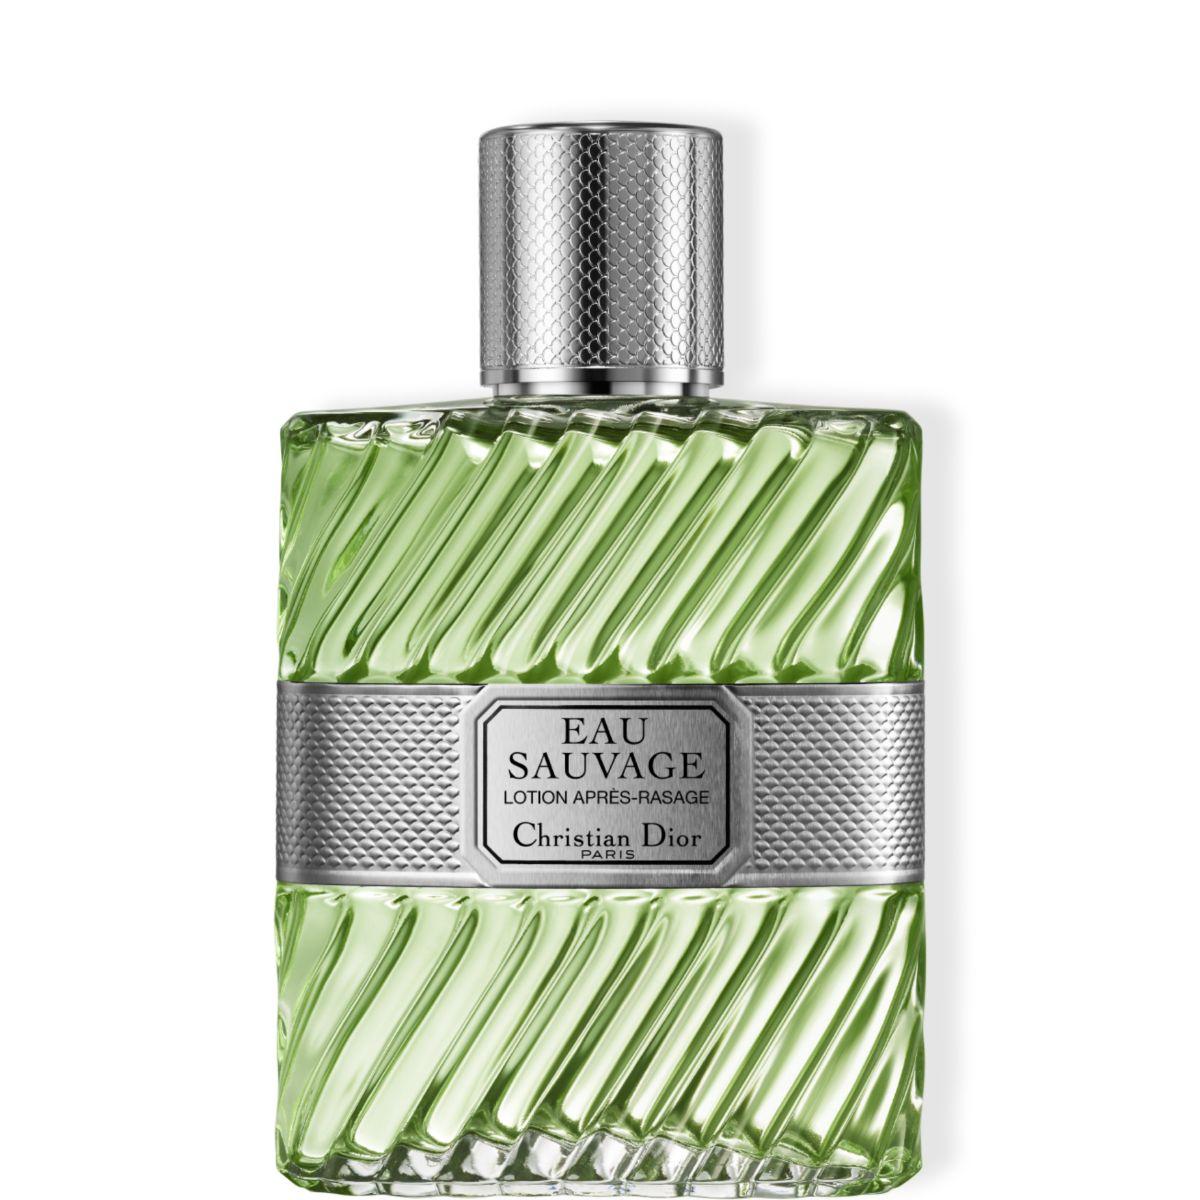 Dior - Eau Sauvage - Lotion après-rasage